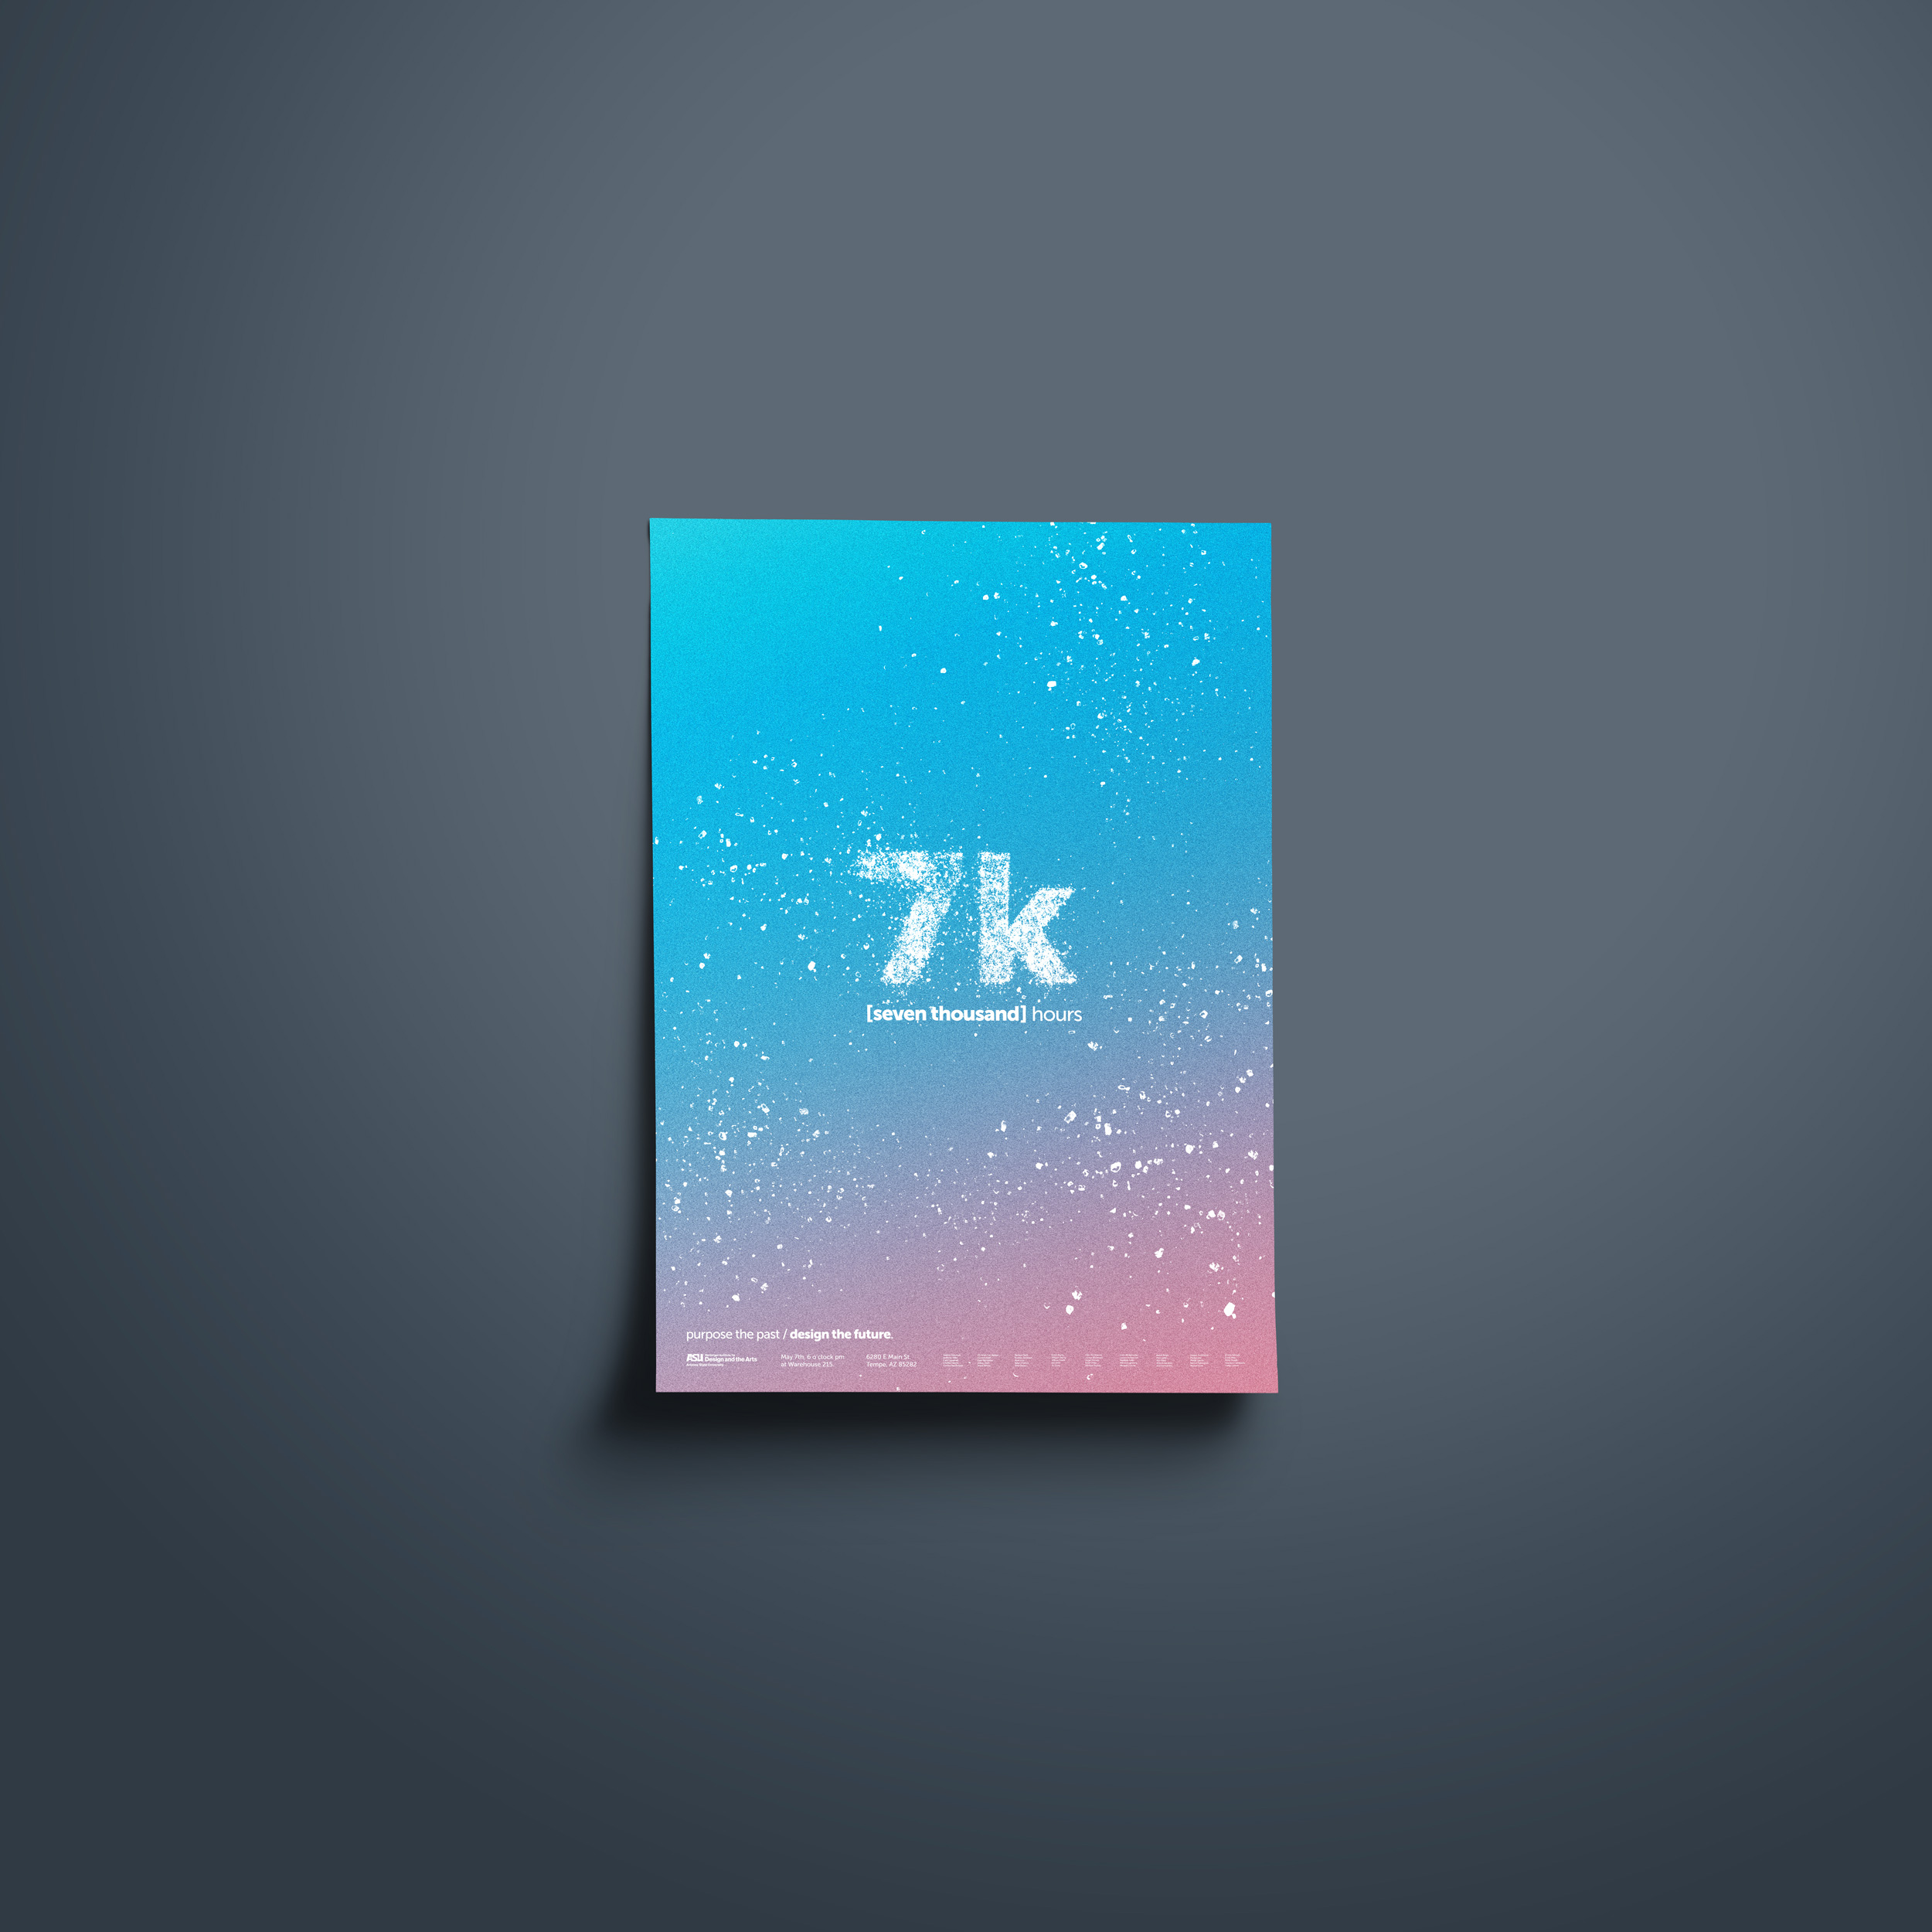 7khrmock2